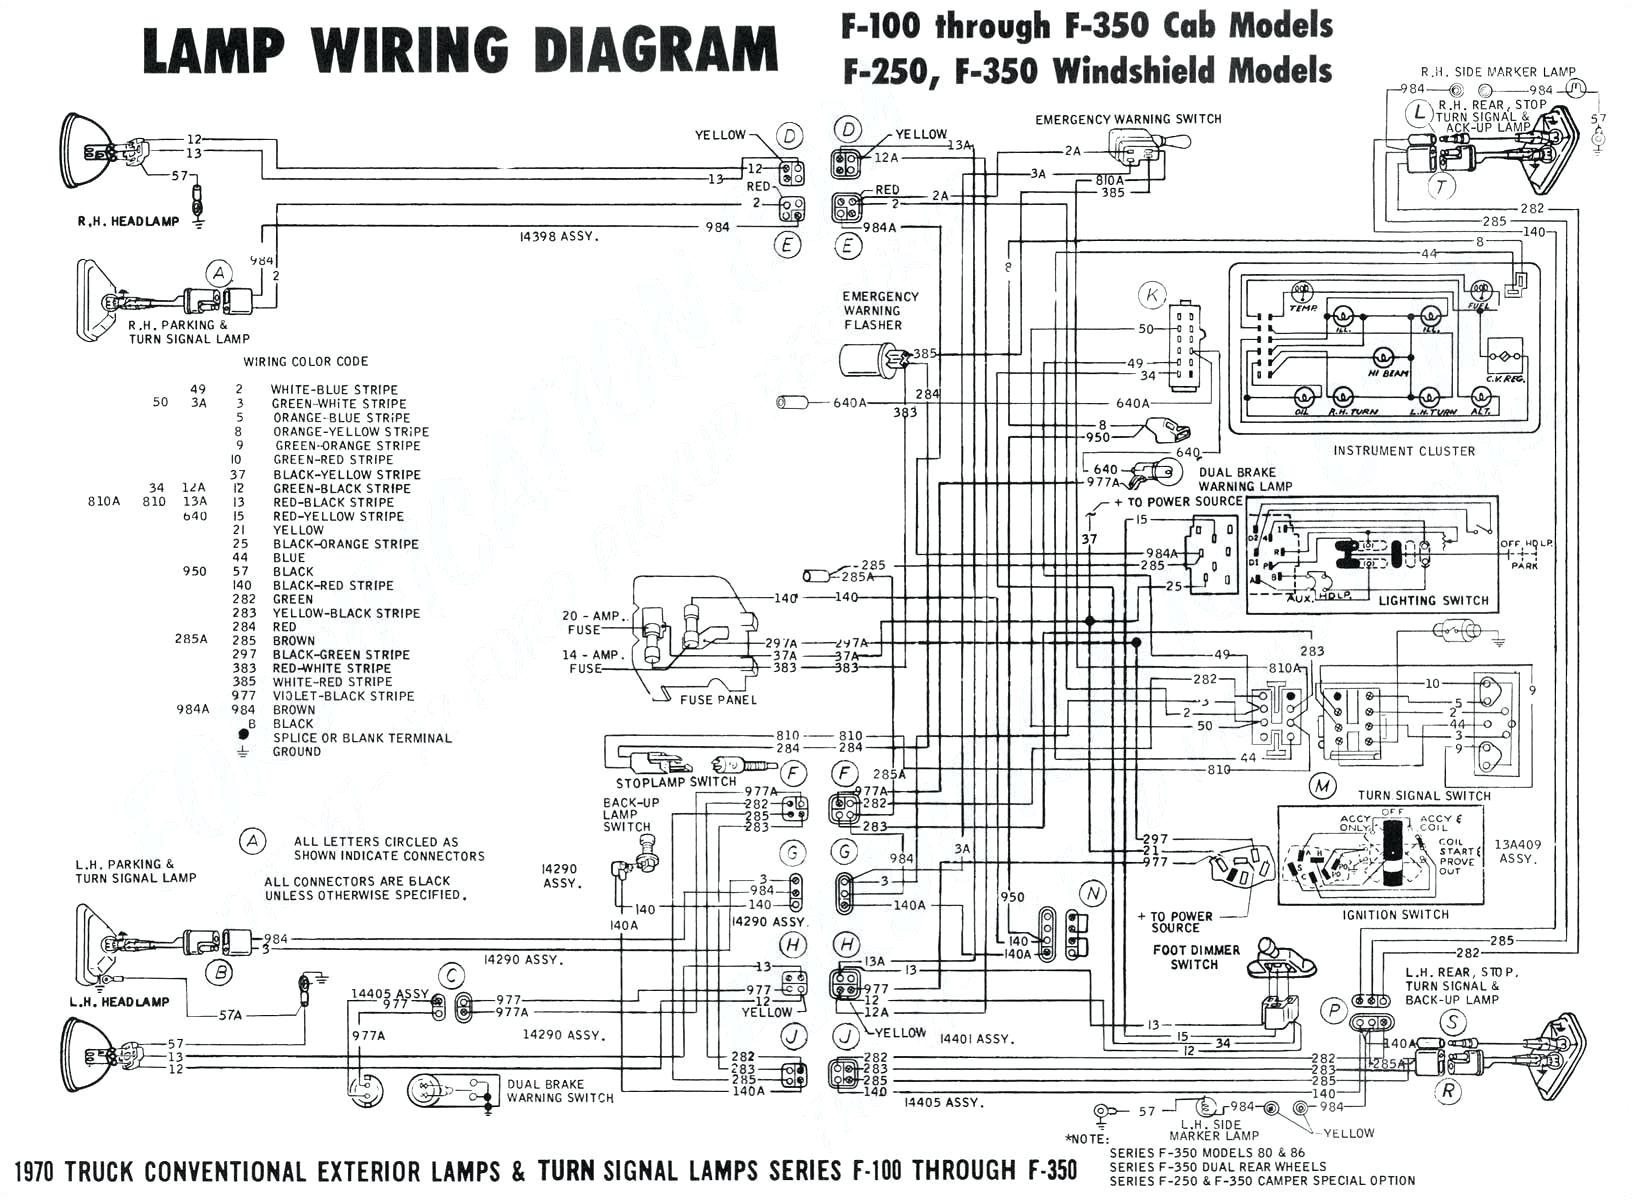 Honda Prelude Alternator Wiring Diagram 1997 Honda Prelude Engine Diagram Moreover ford F 150 Alternator